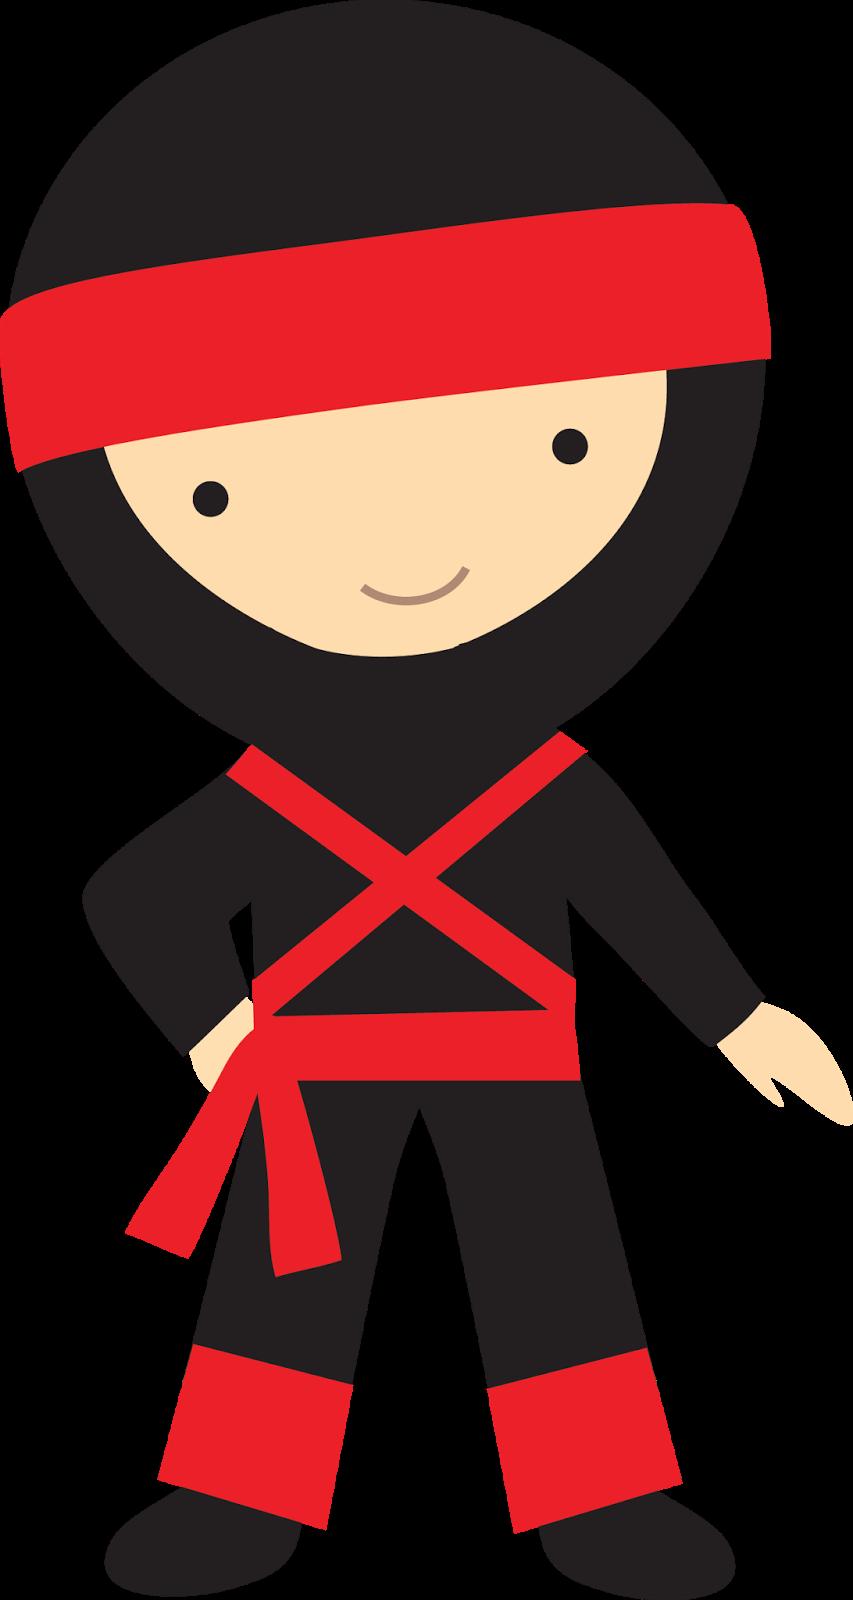 Ninja clipart cartoon chinese. Pin by hila abraham